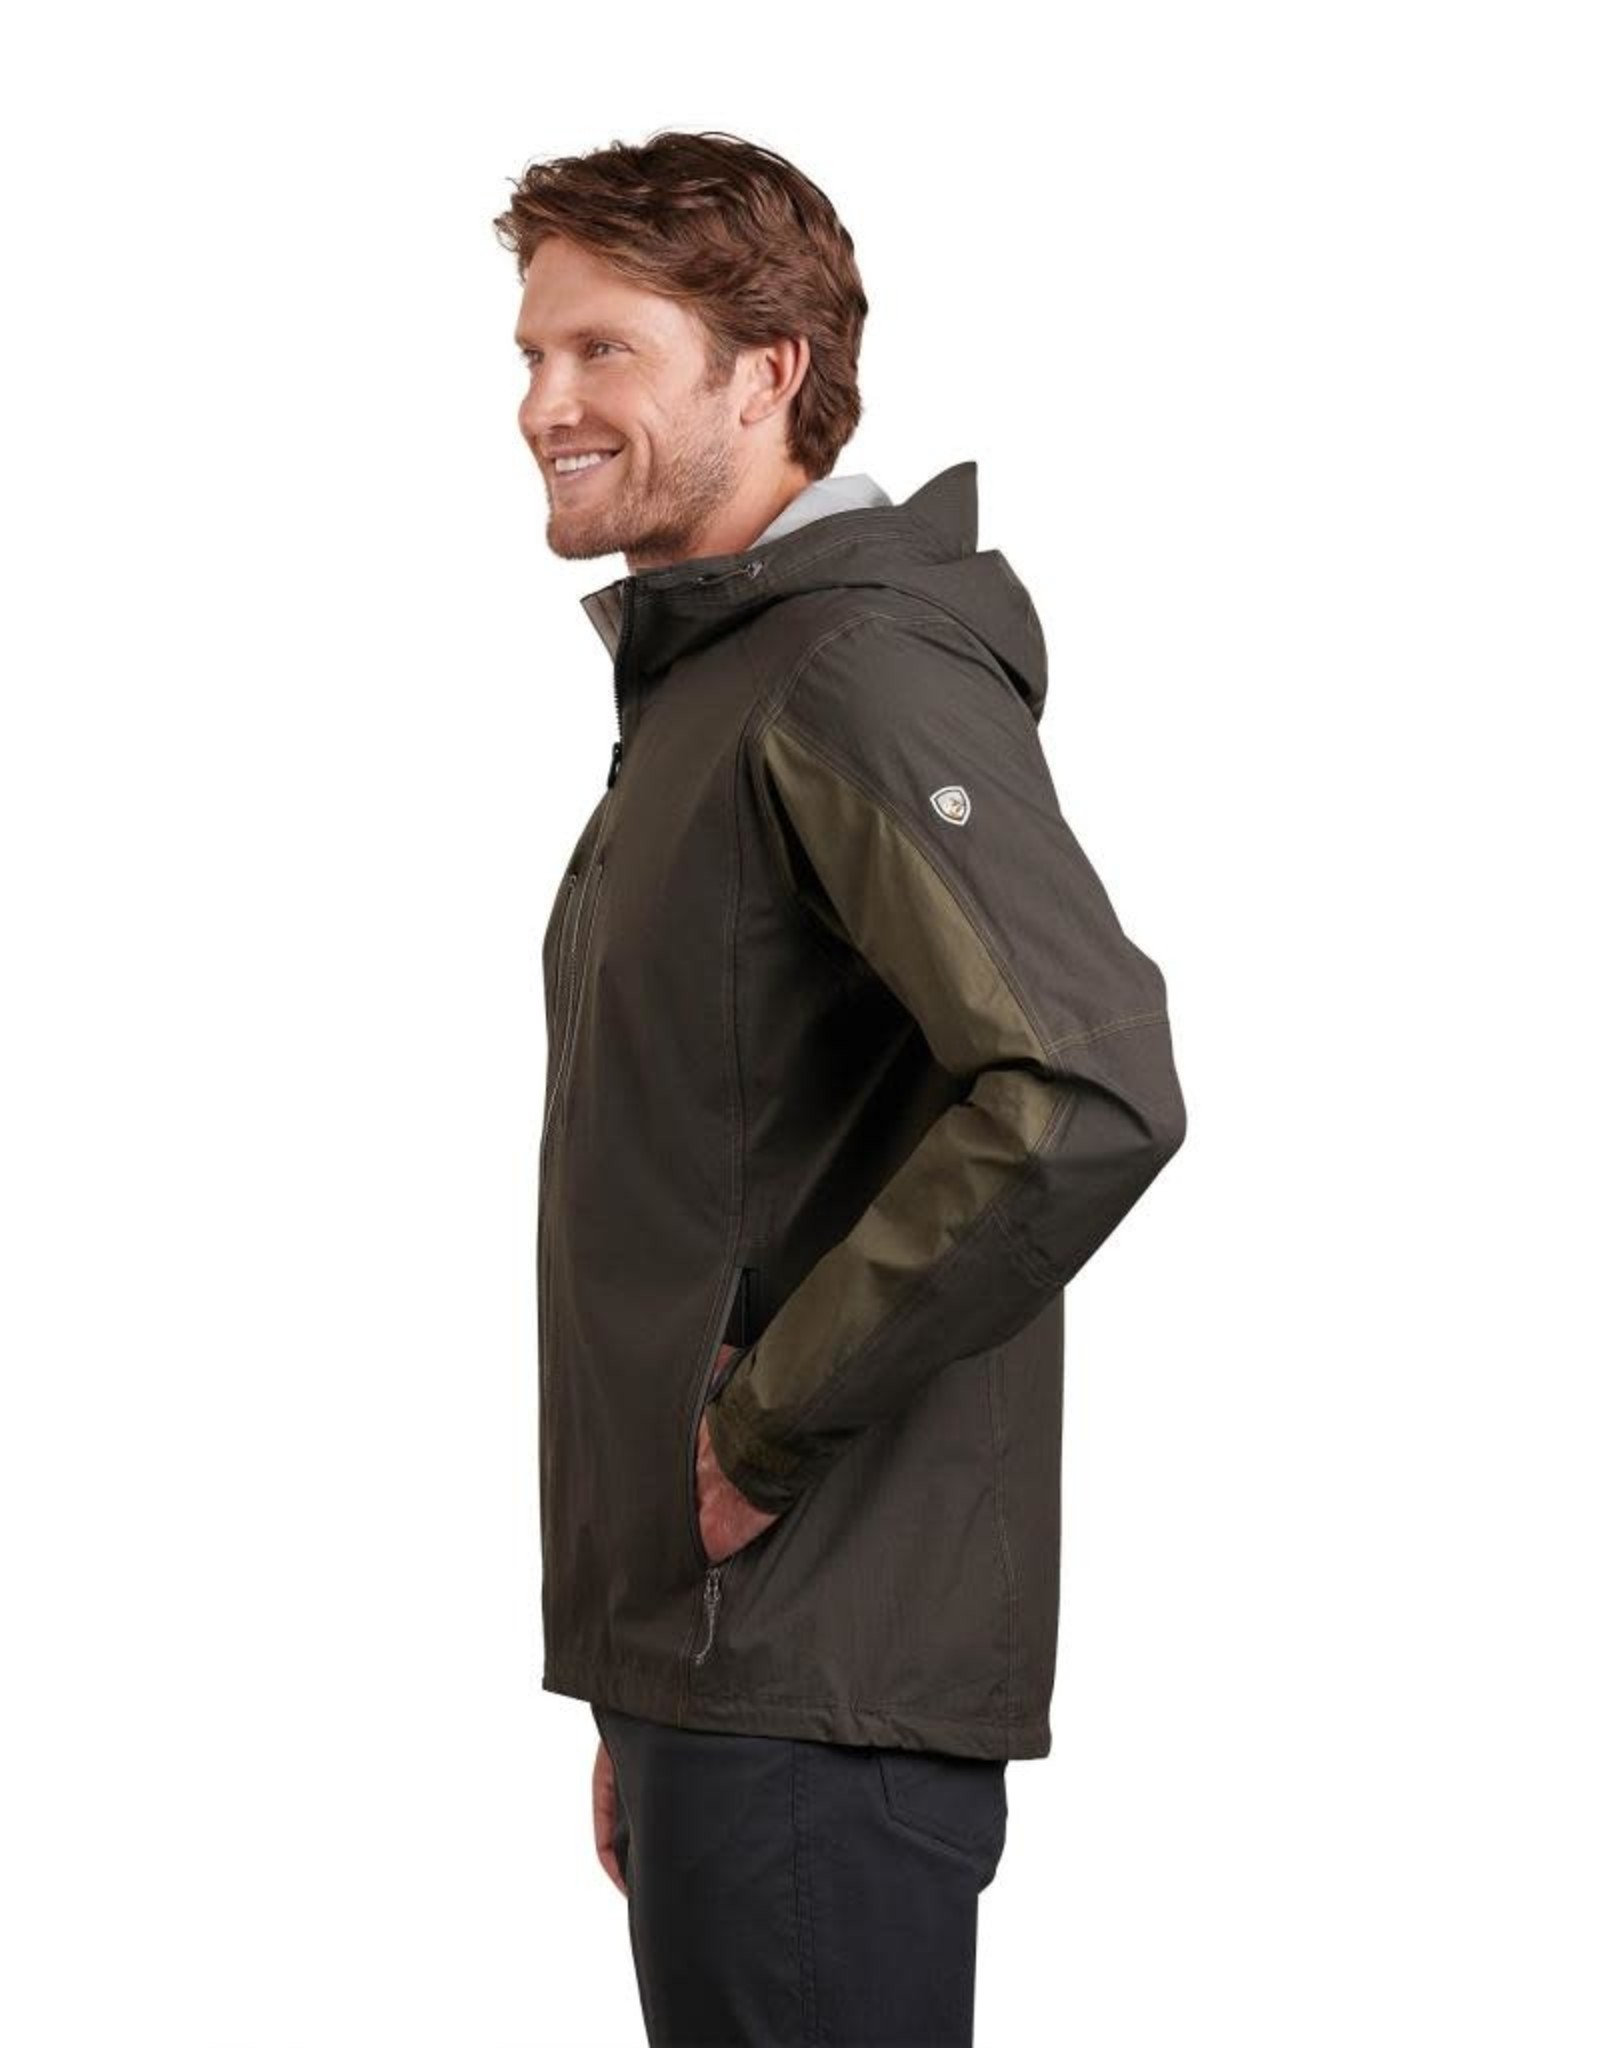 KUHL Men's Jetstream Jacket